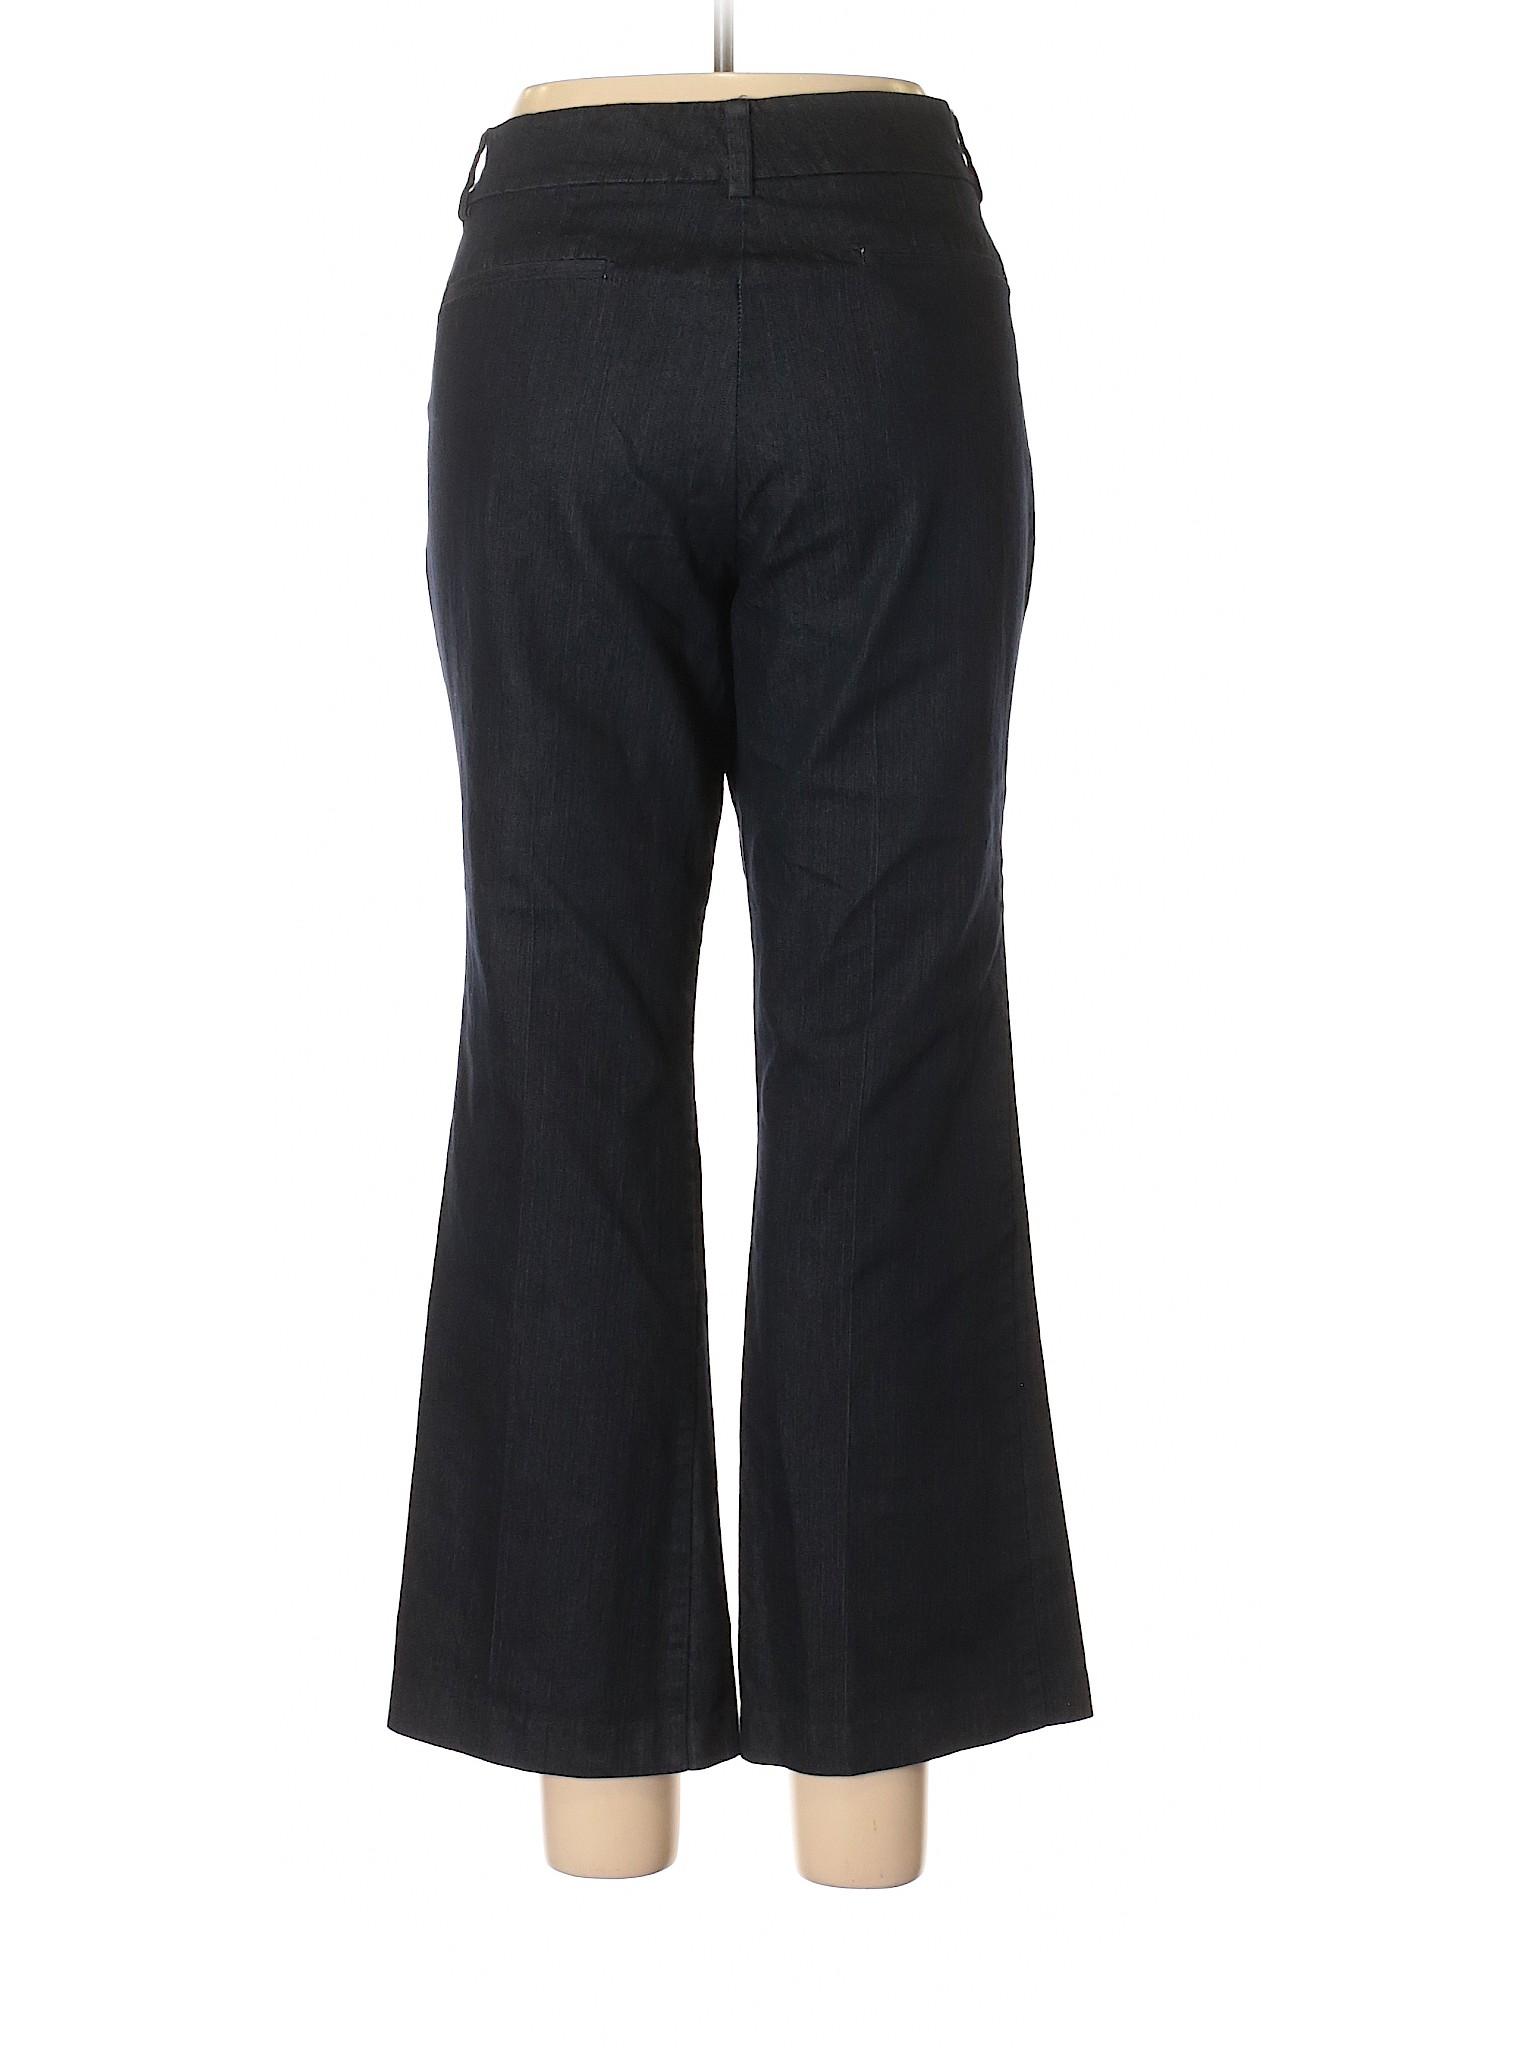 Pants Company winter New amp; Casual York Leisure TY8Ixqq